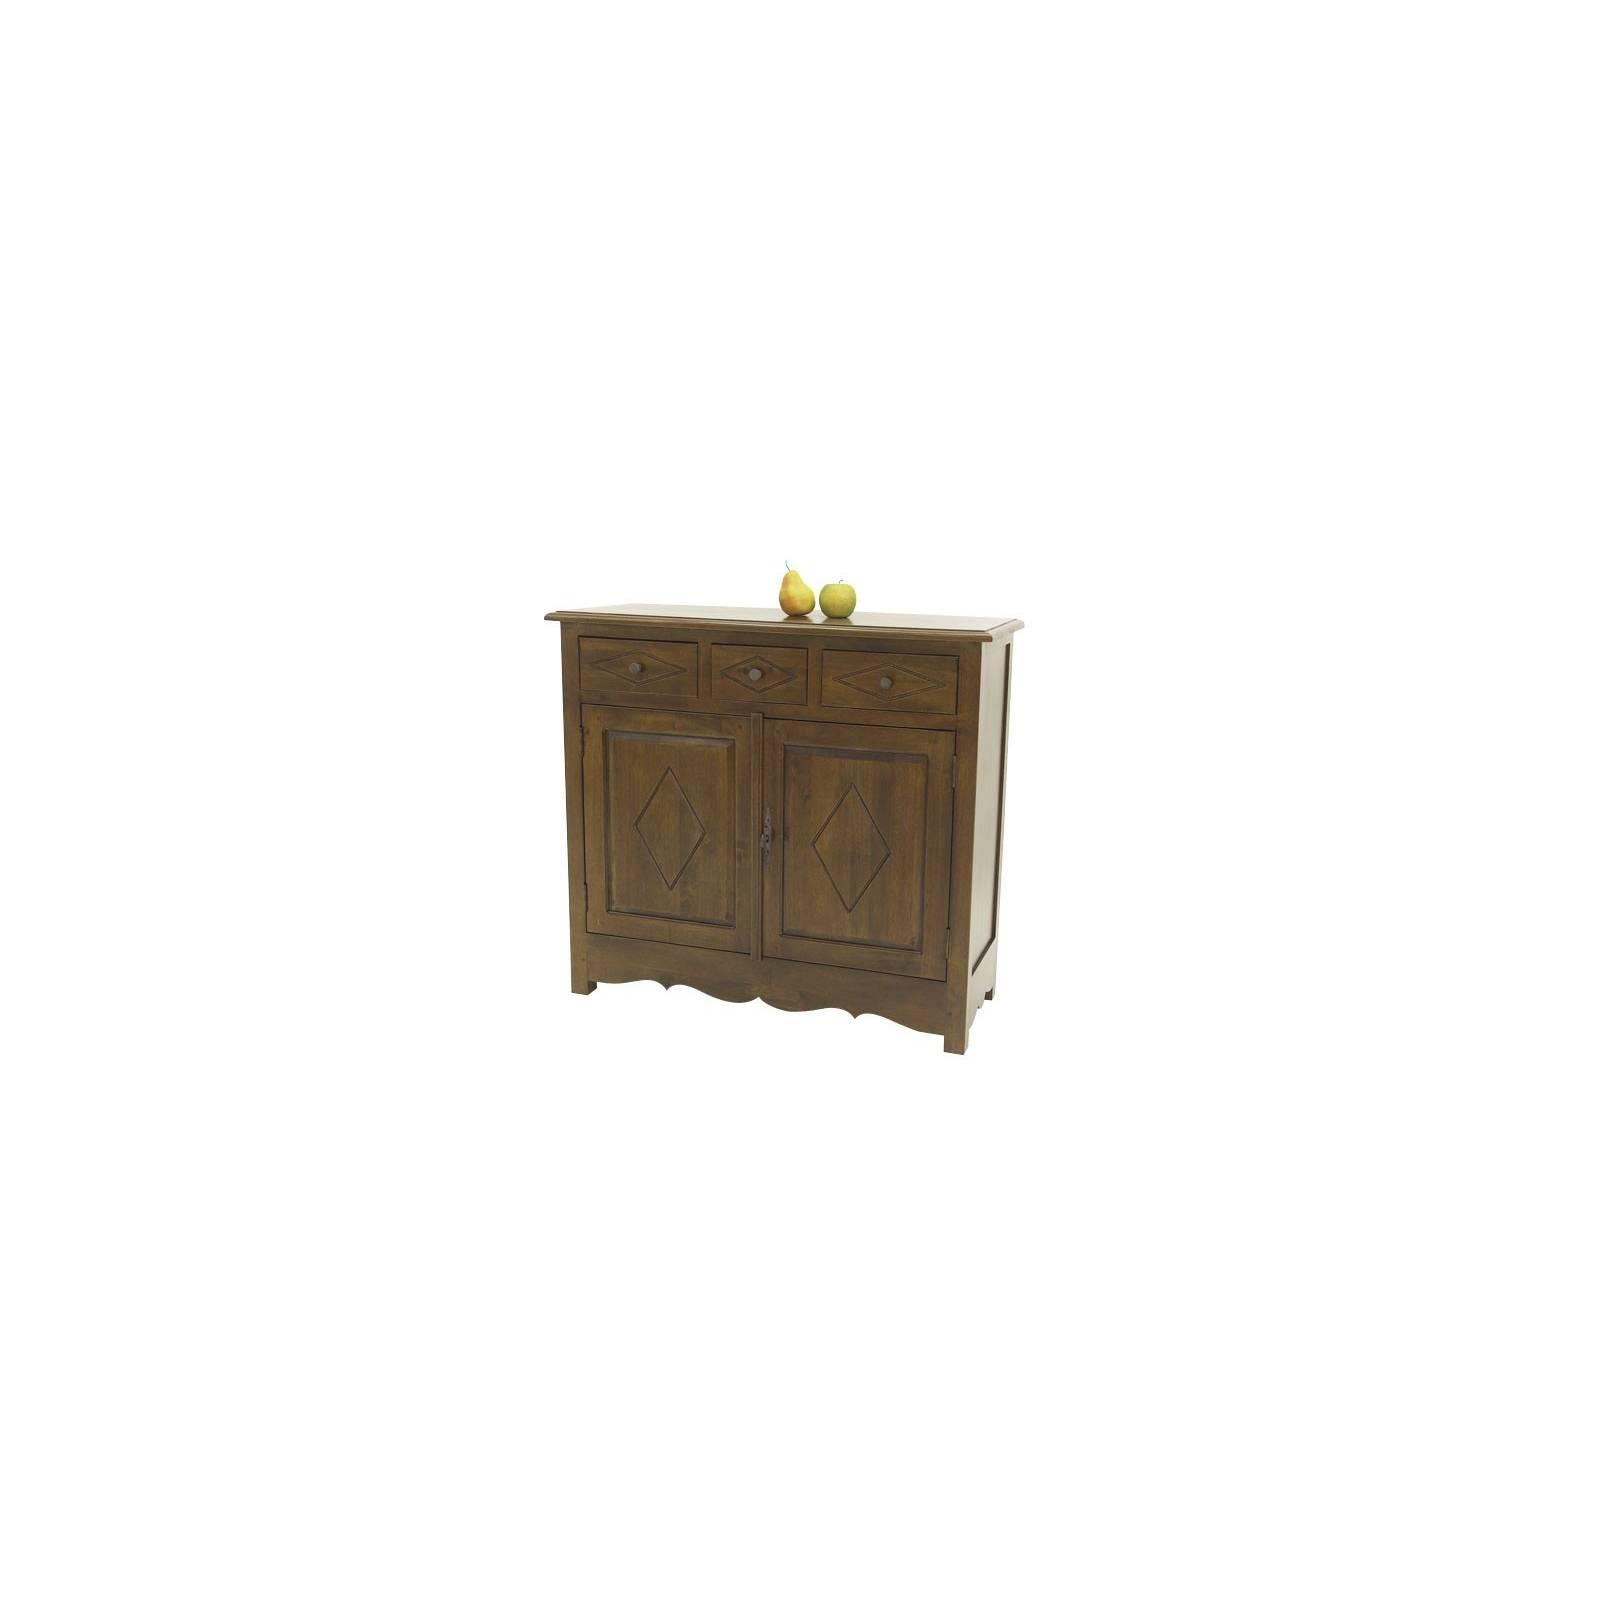 Buffet Country Hévéa - meubles bois exotique